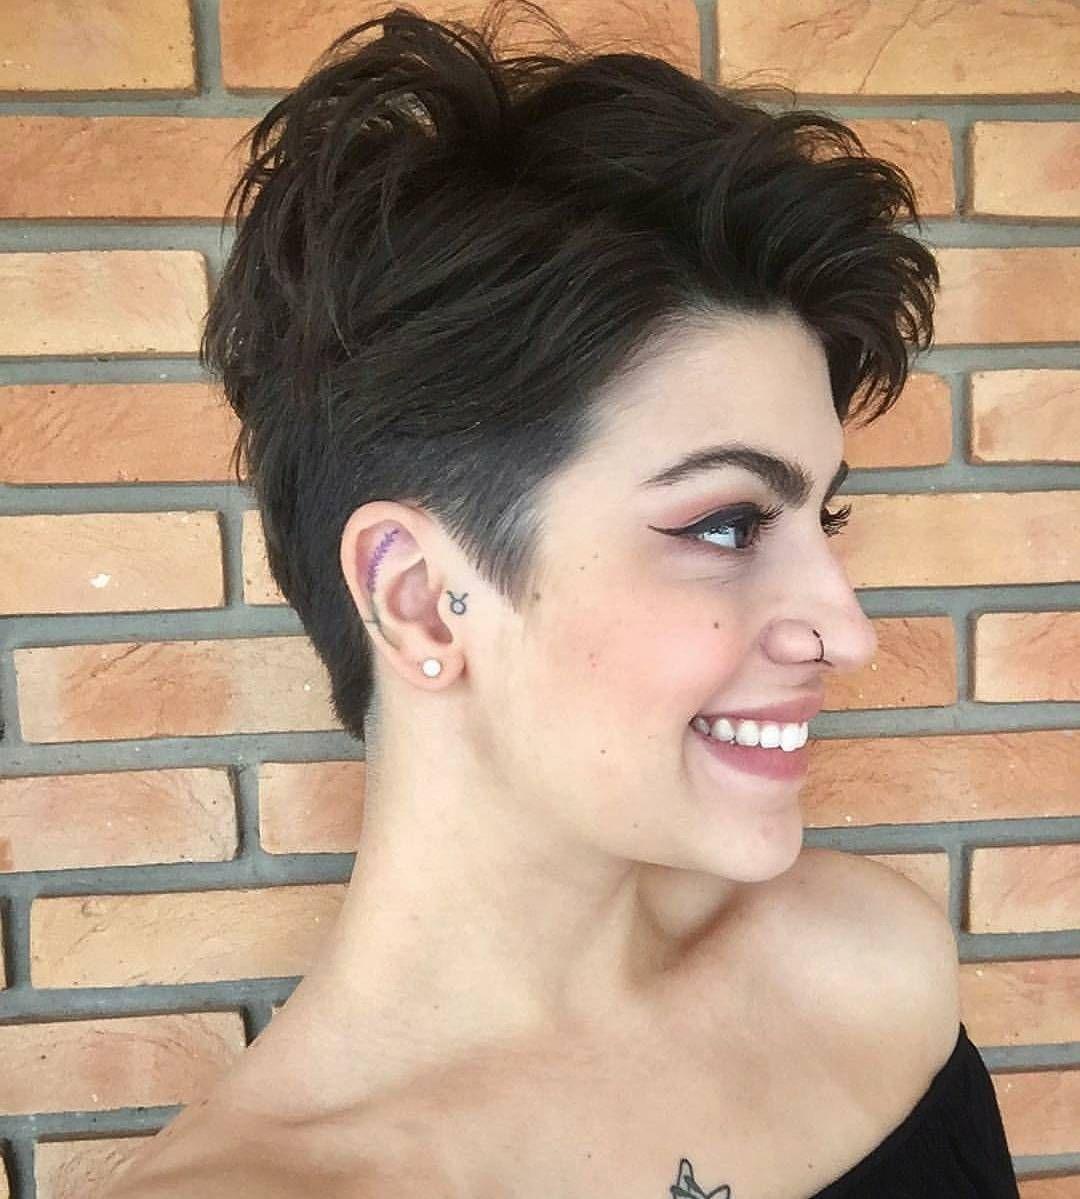 Stylish pixie haircut best short hair styles for women